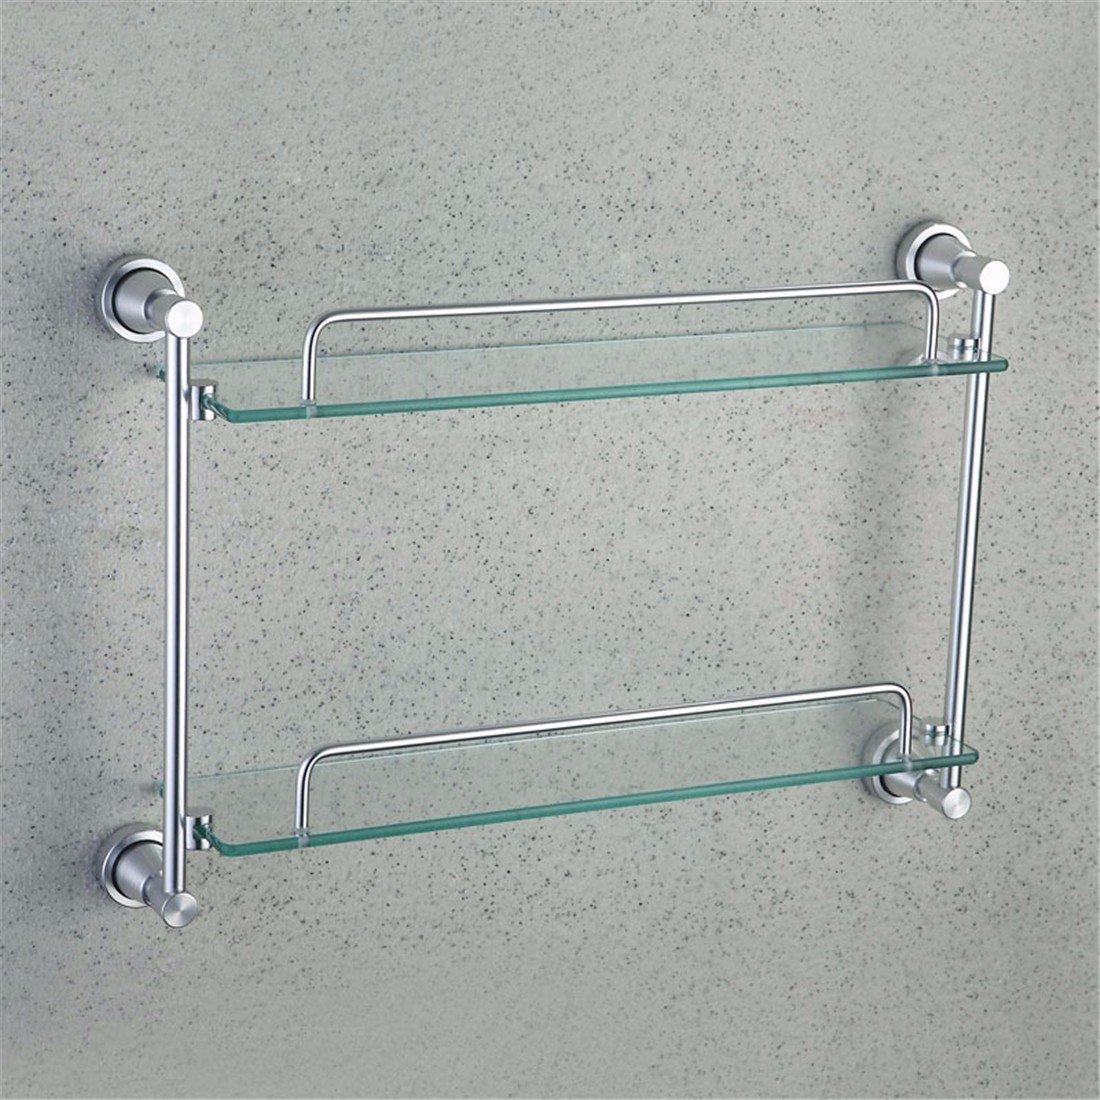 LAONA Contemporary space aluminum wiredrawing bathroom fittings, toilet brush rack, towel bar, toilet paper rack,Rack 2